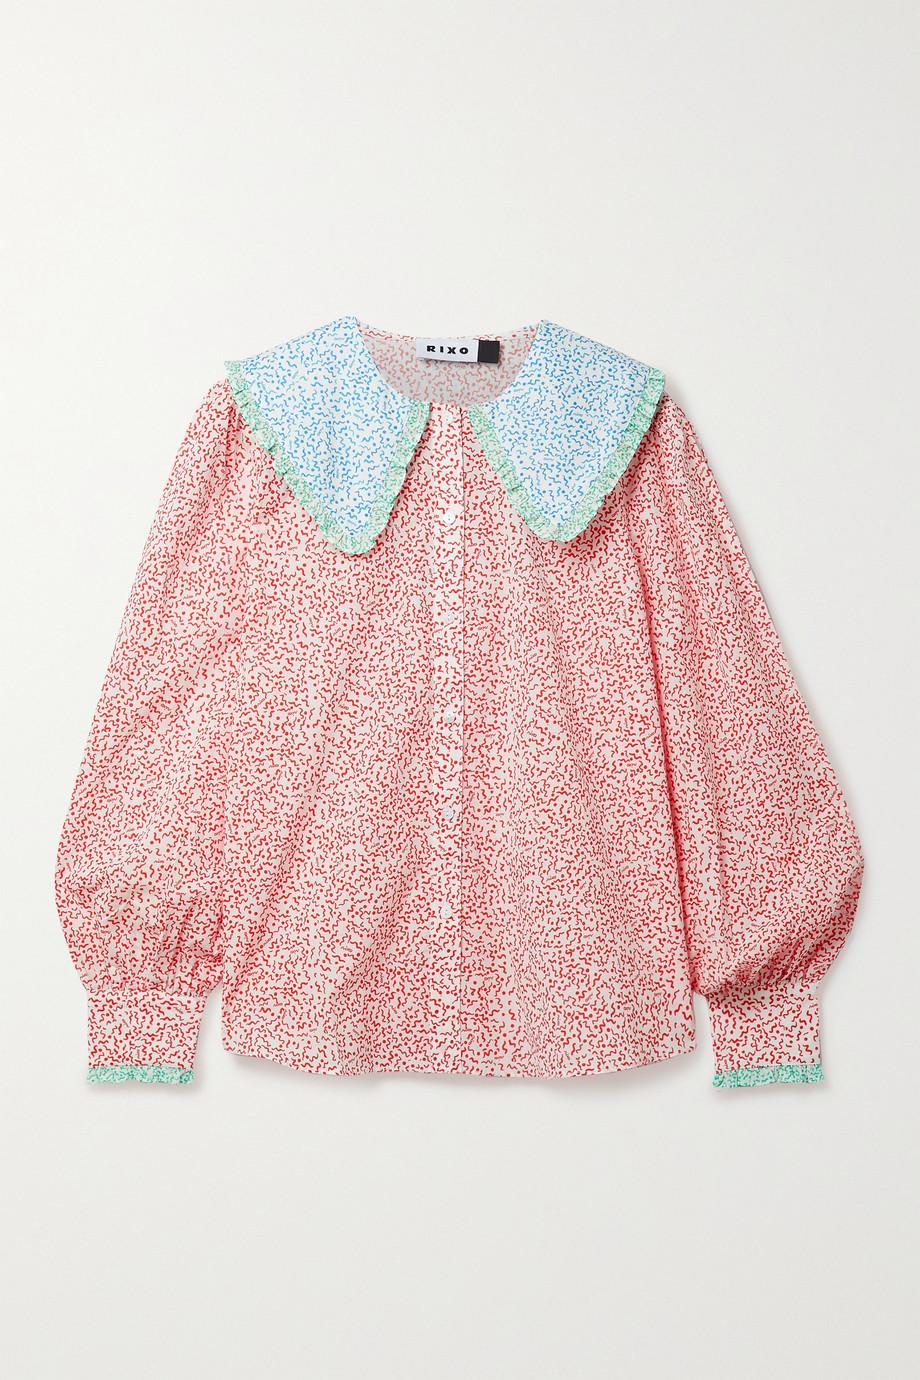 RIXO Misha ruffled floral-print cotton blouse